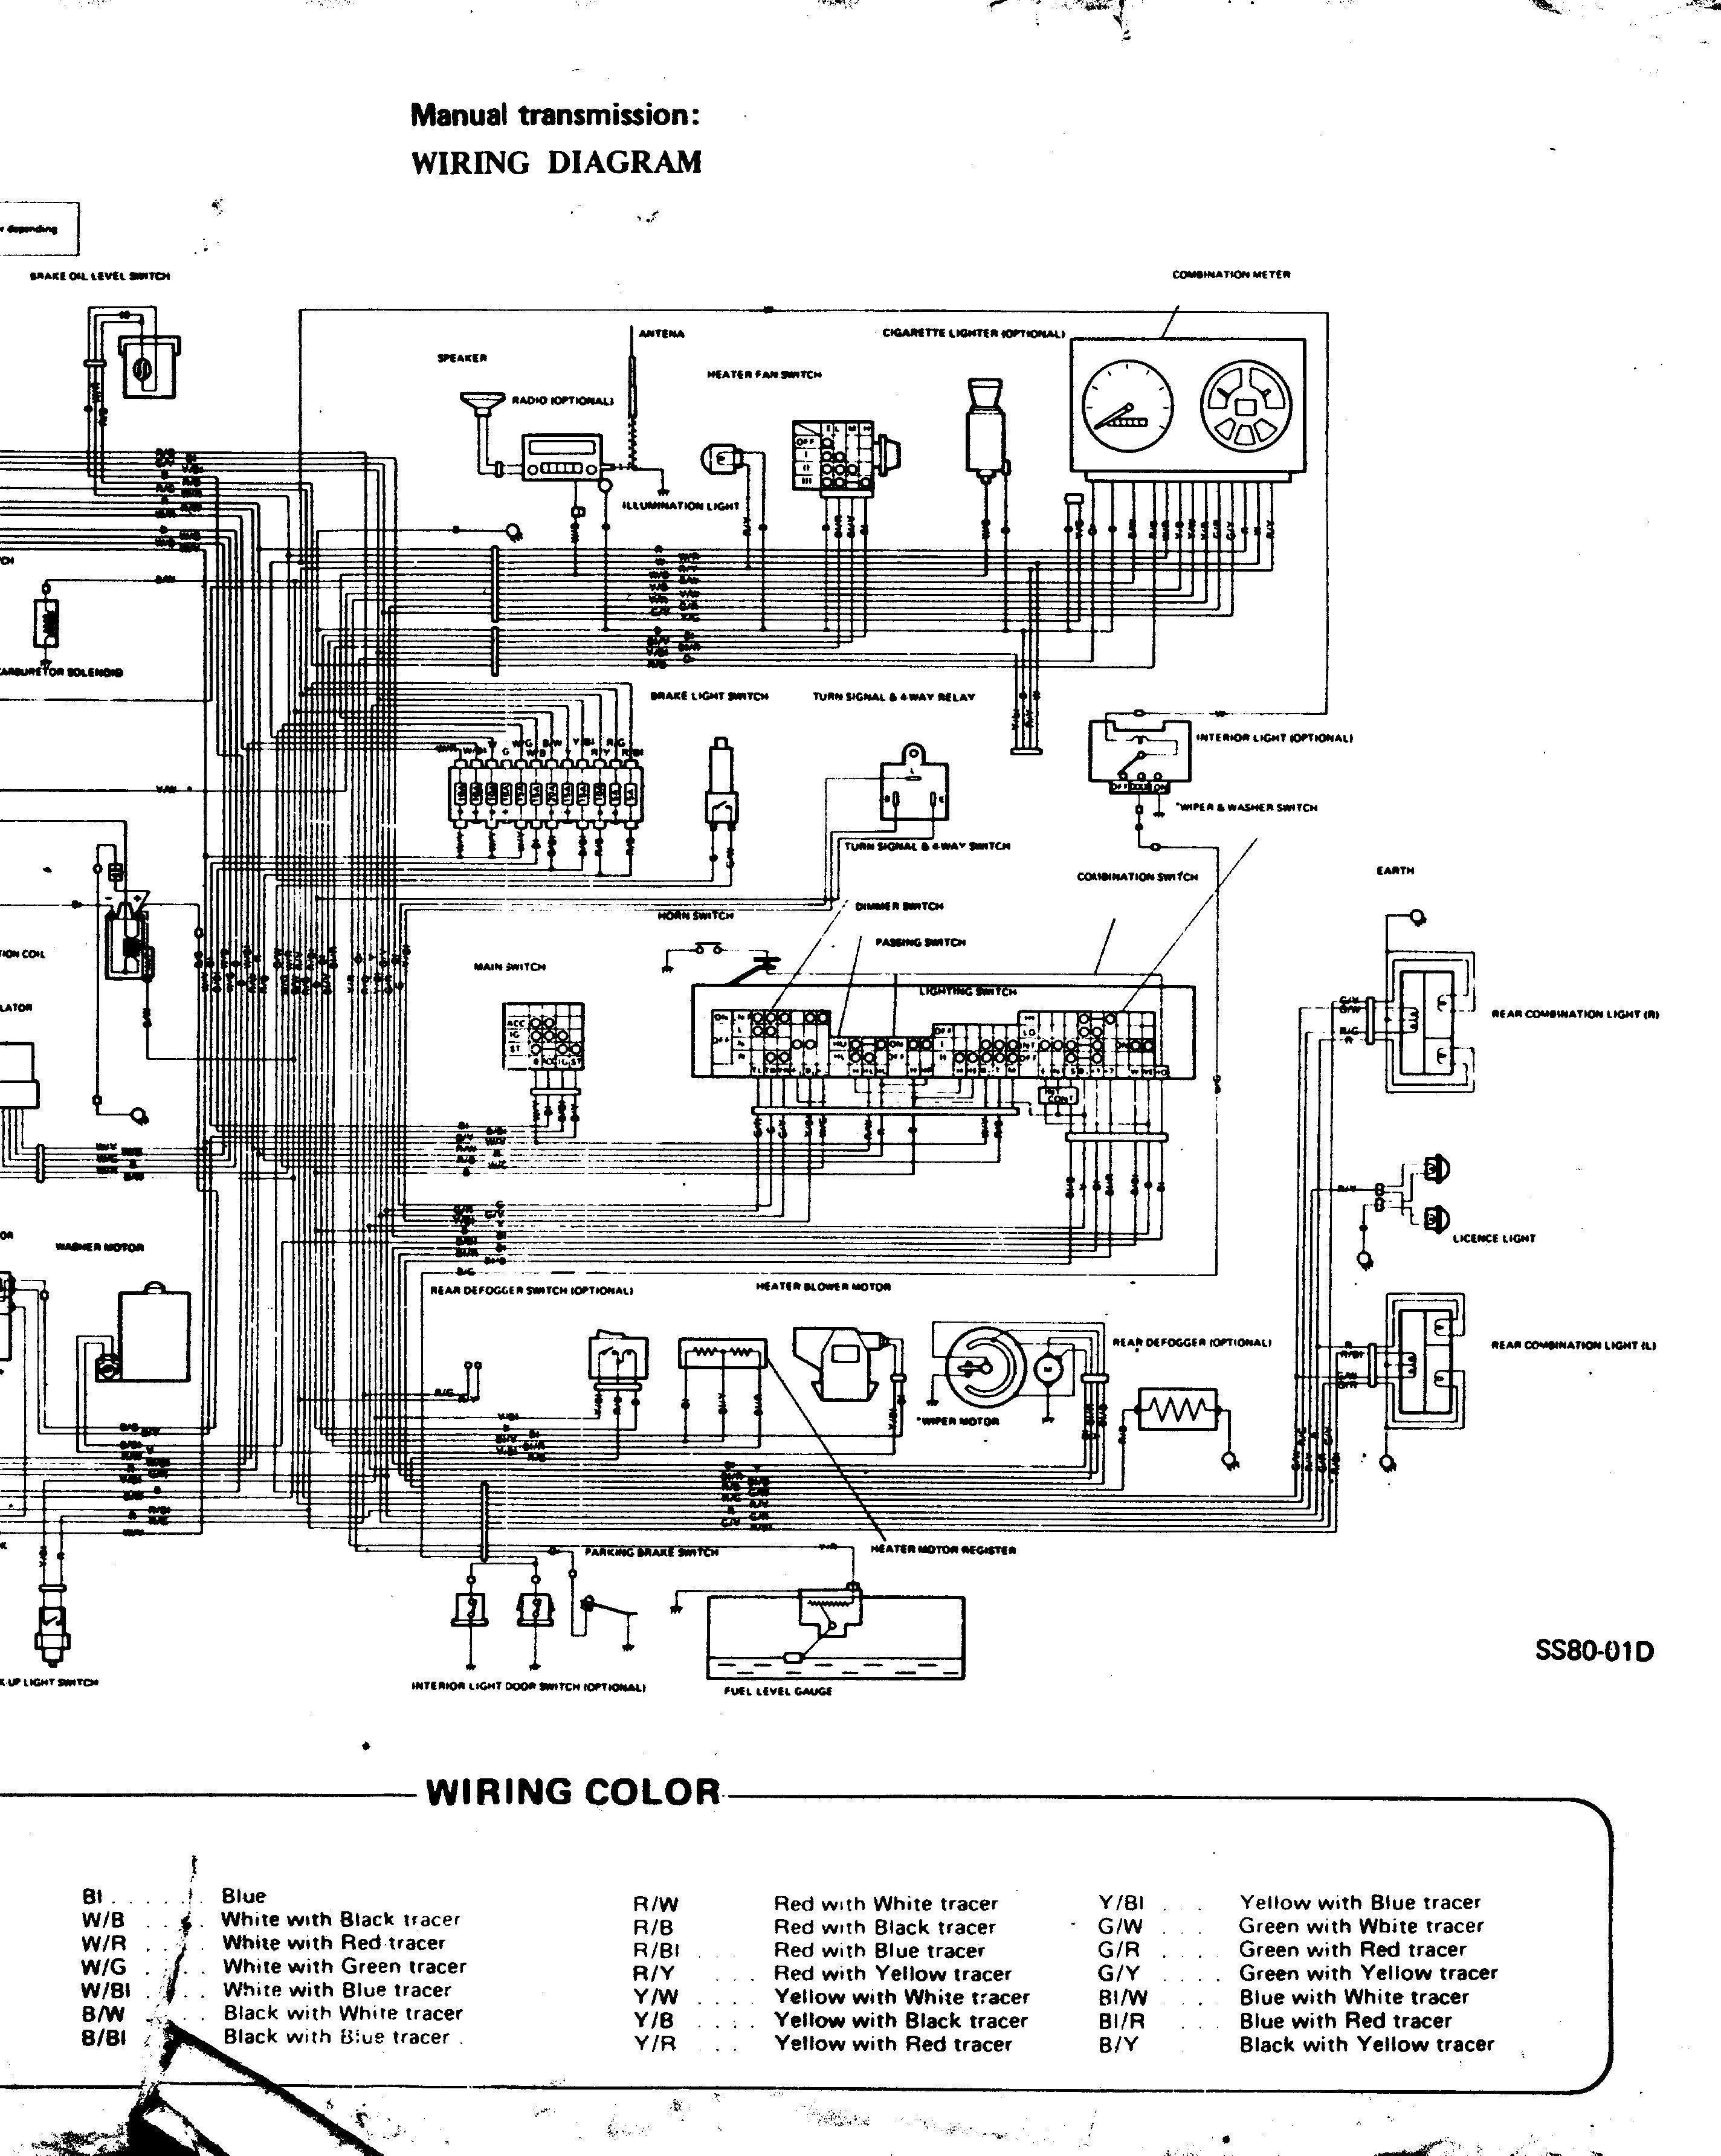 suzuki fa50 wiring diagram wiring diagram blog1980 suzuki fa50 wiring diagram wiring diagram suzuki gs850 wiring diagram suzuki fa50 wiring diagram